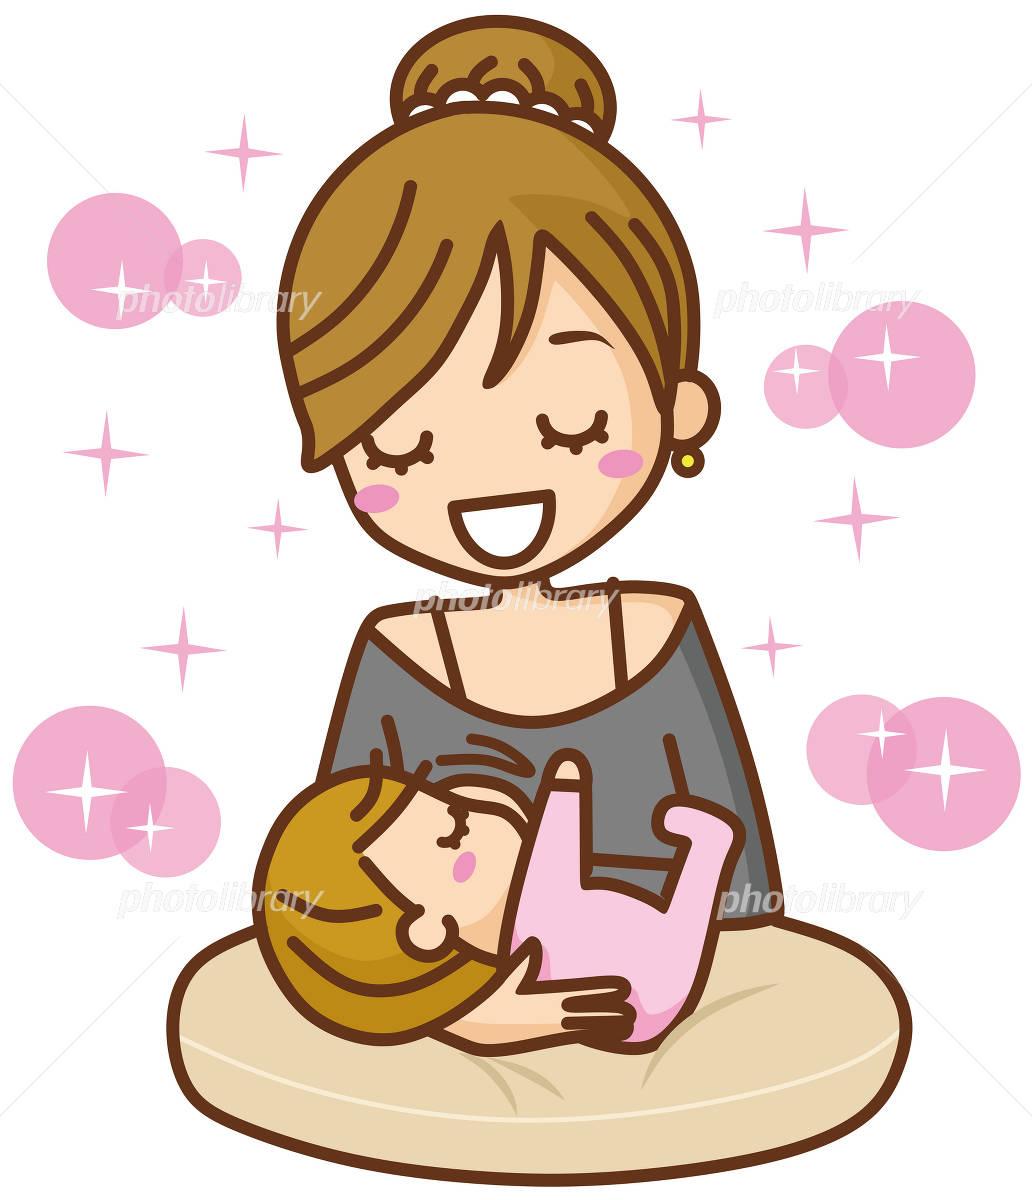 akatya mlk2 - 【部屋対応】平日昼間に人妻さんの敏感乳首舐め対応 | 東京八王子